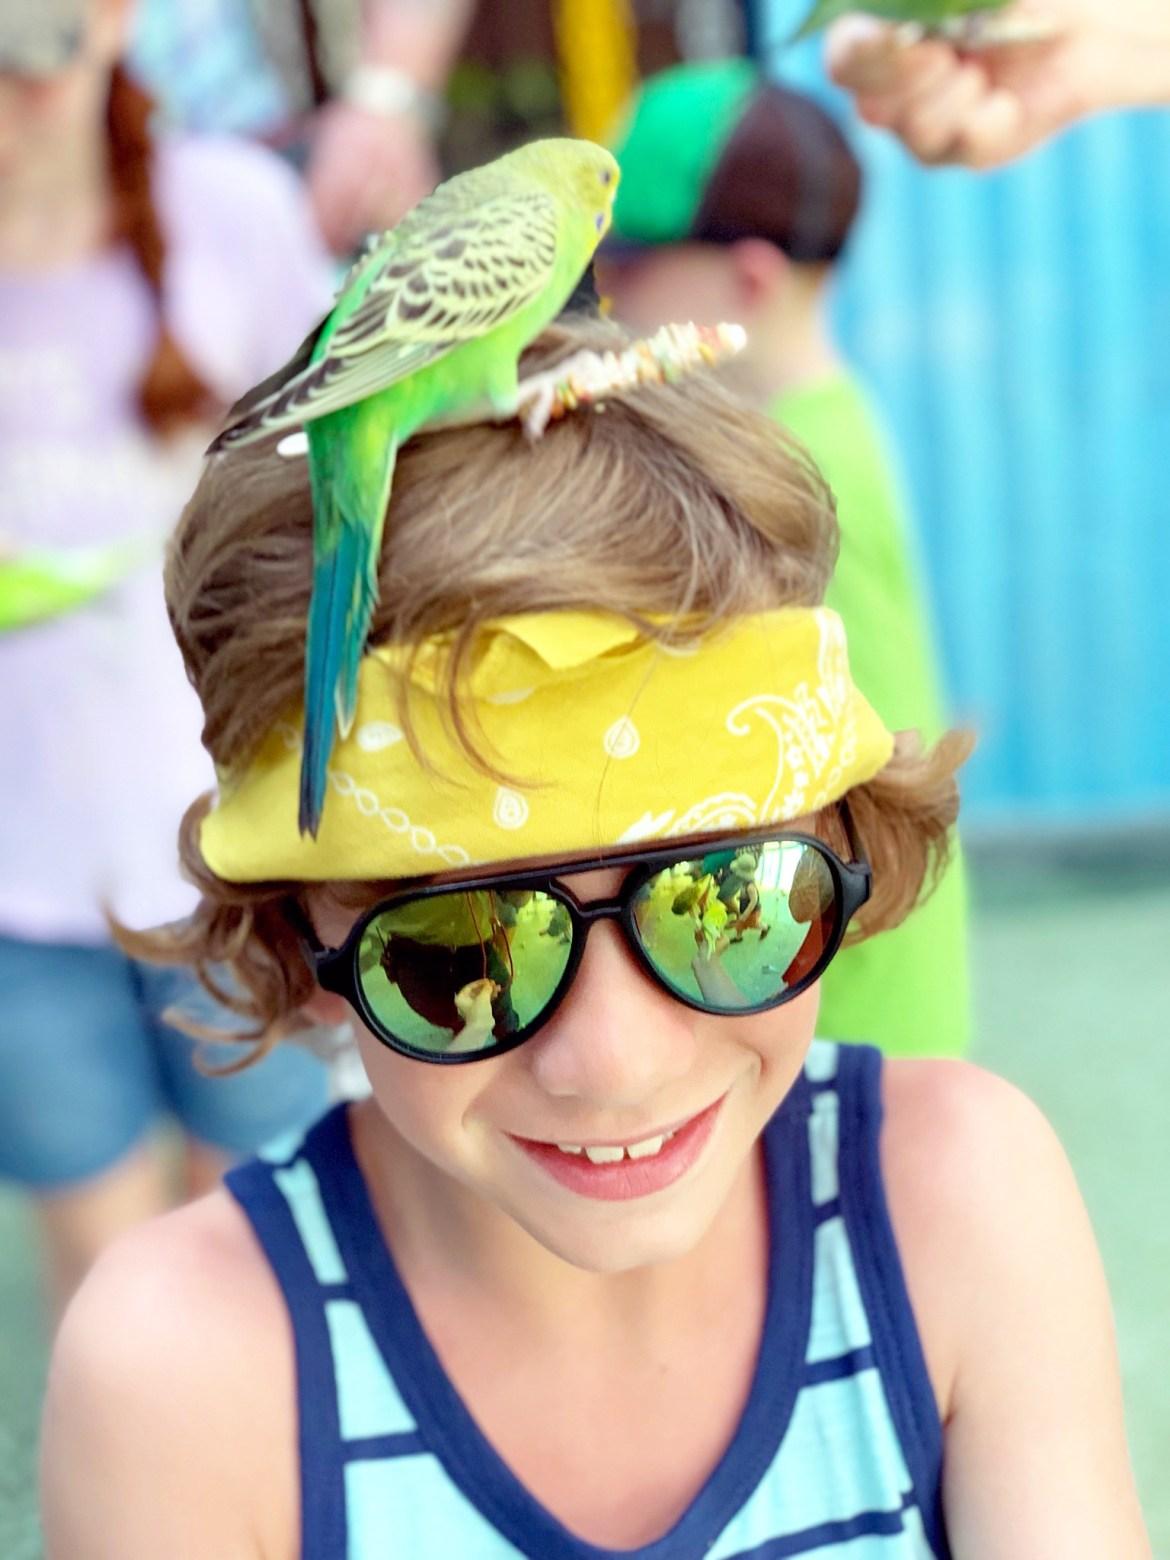 Five Reasons to visit Gatorland, Orlando